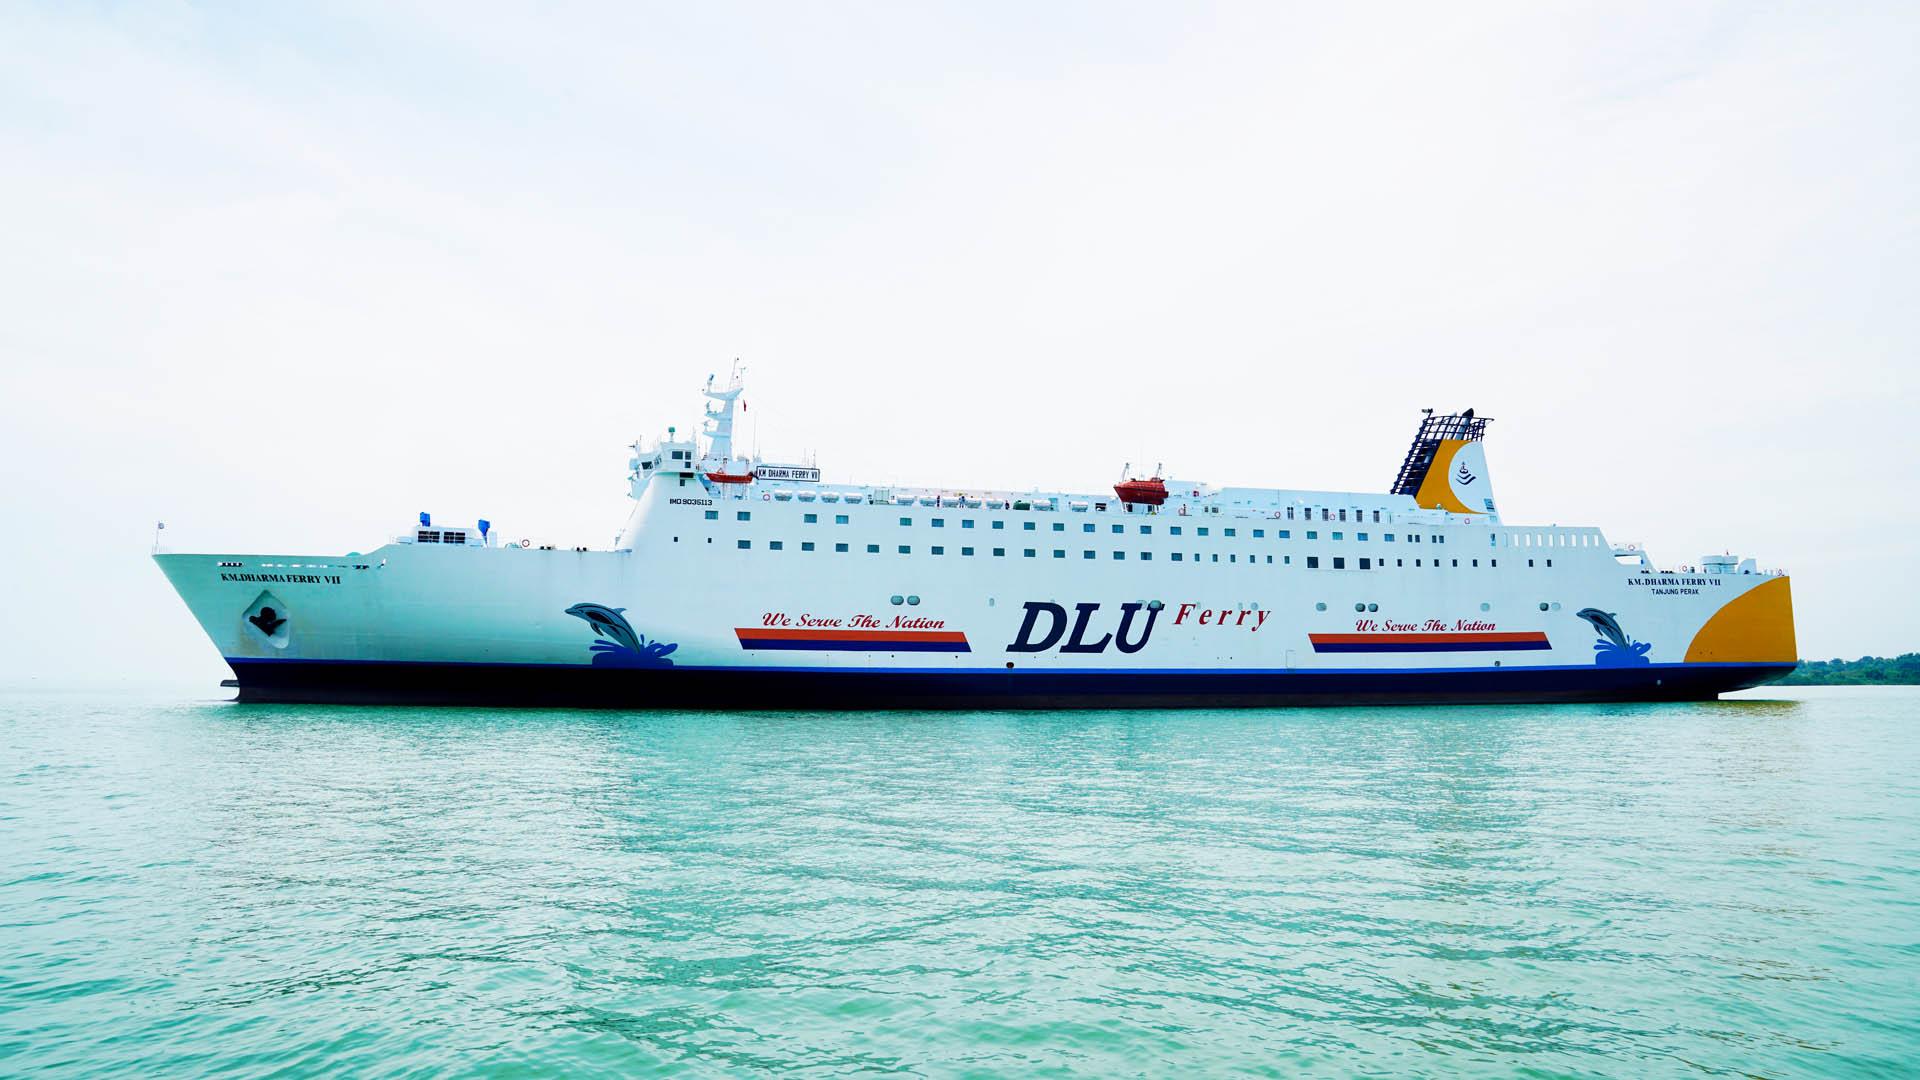 KM. Dharma Ferry 7